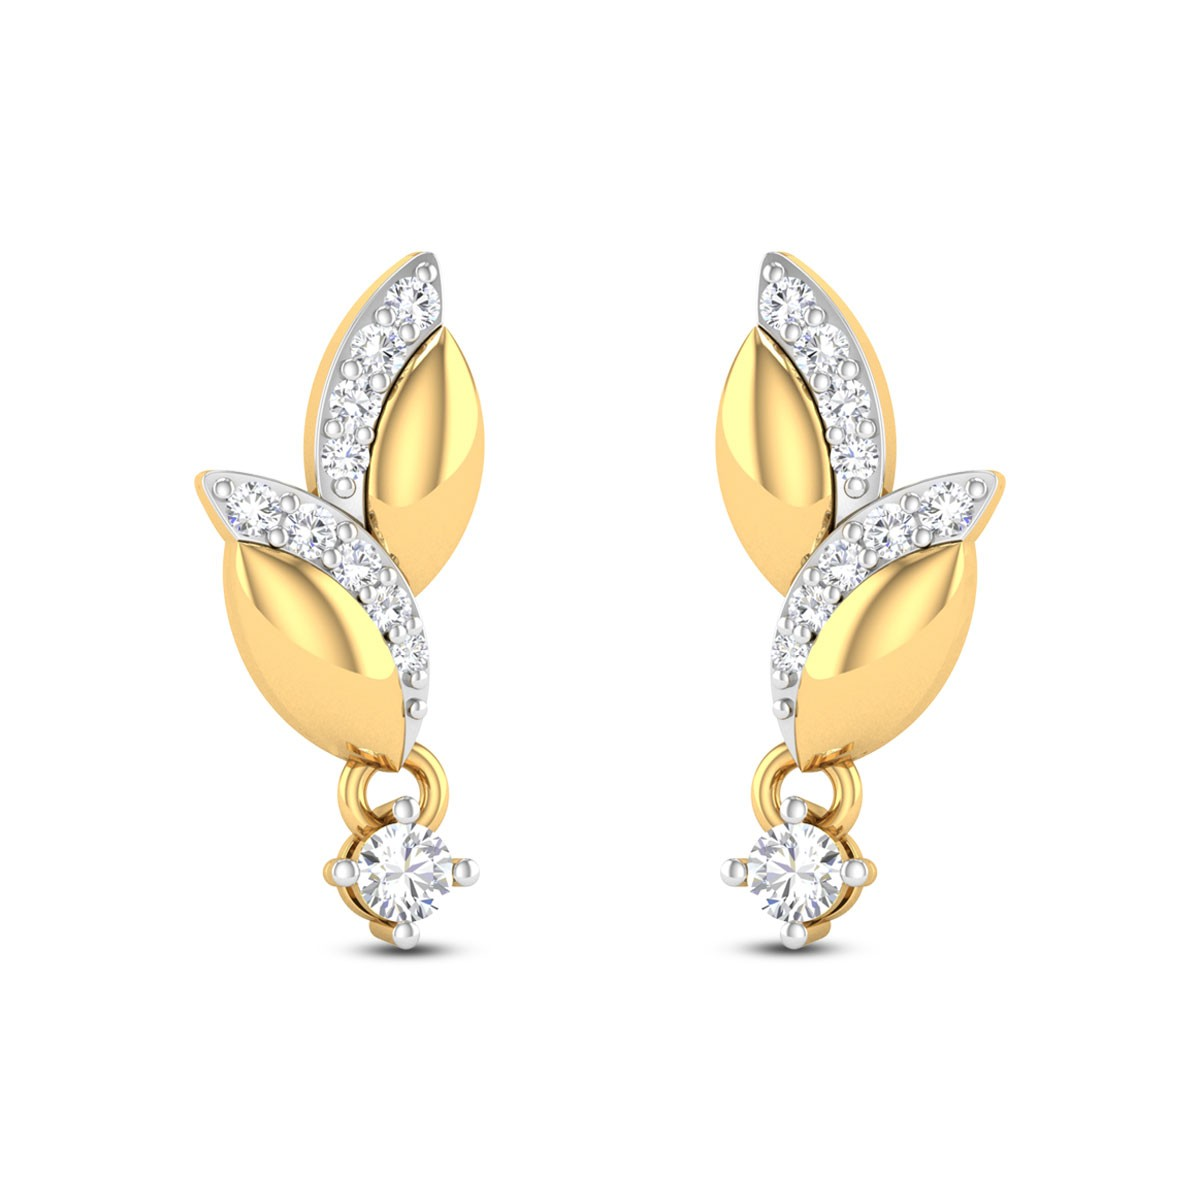 Uranus Stud Earrings